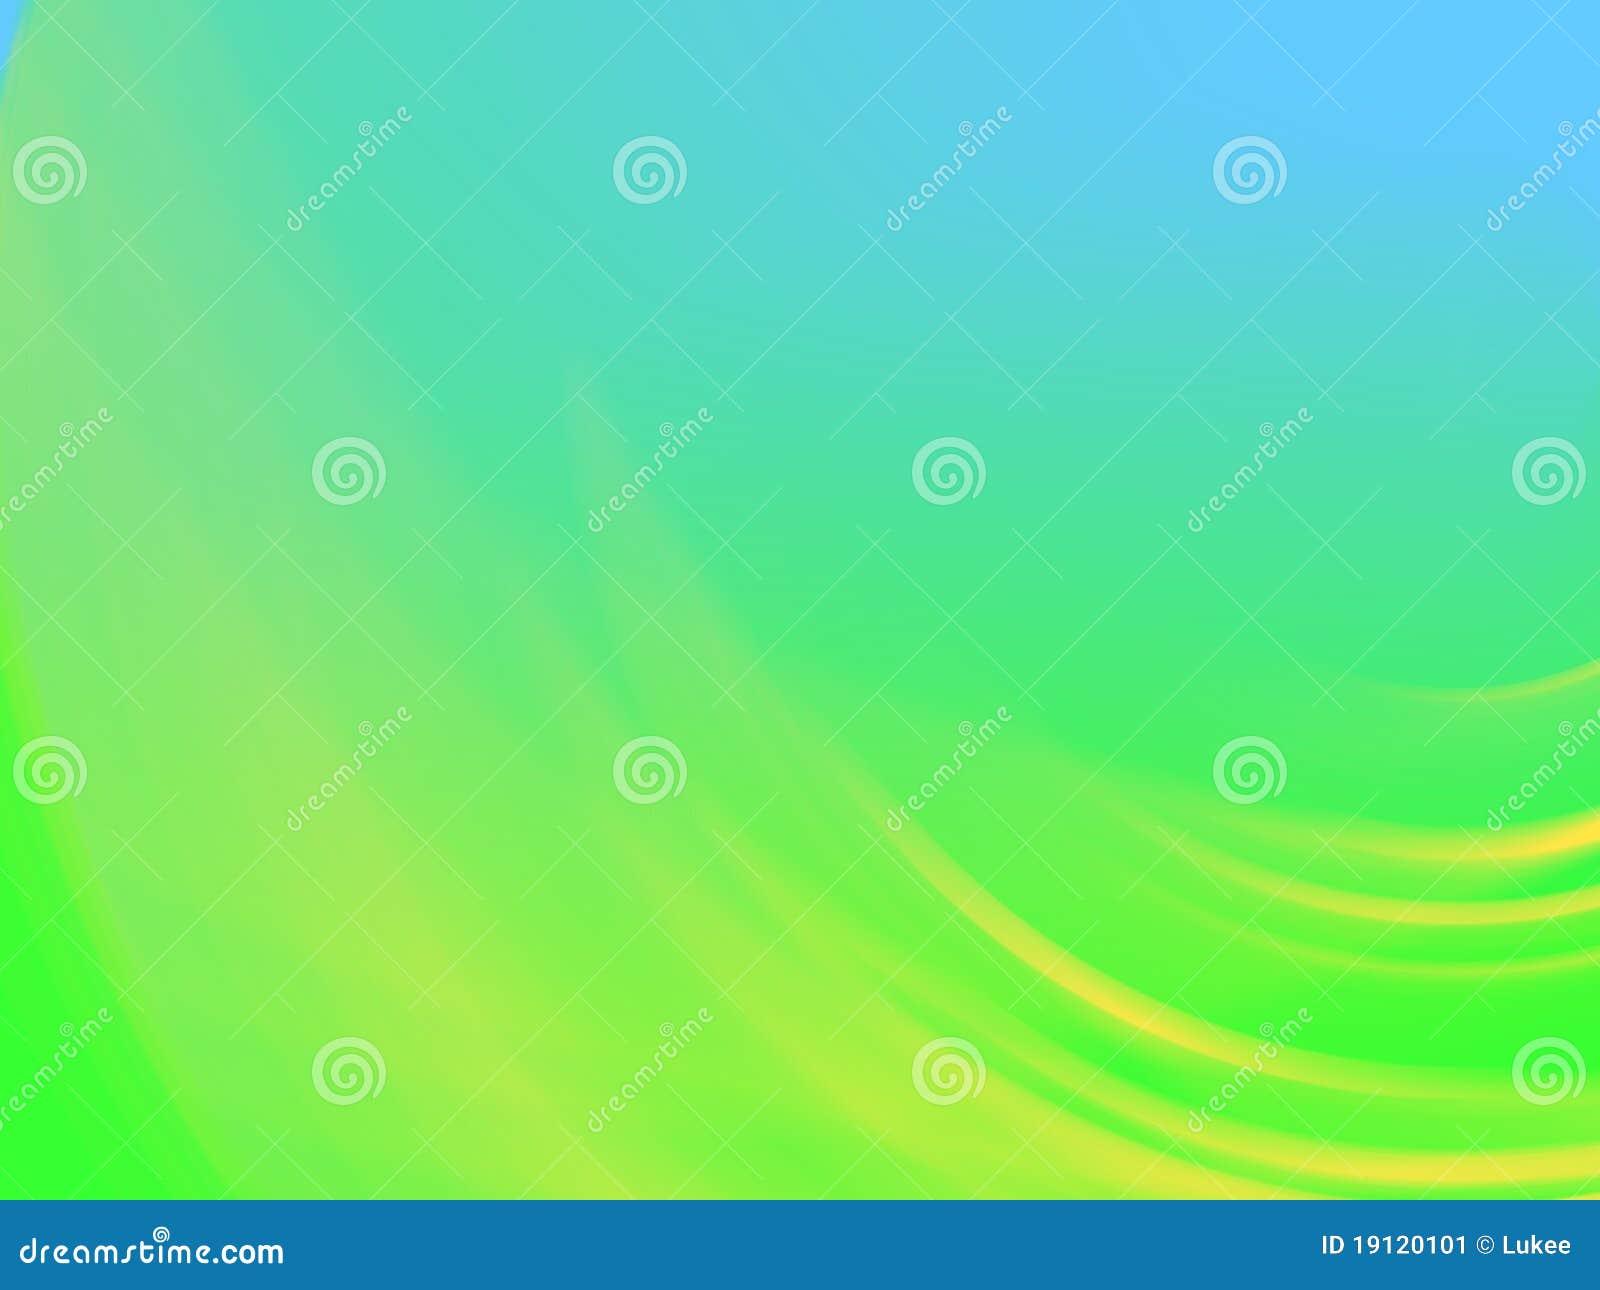 fond vert bleu avec le groupe jaune illustration stock illustration du conception courbe. Black Bedroom Furniture Sets. Home Design Ideas